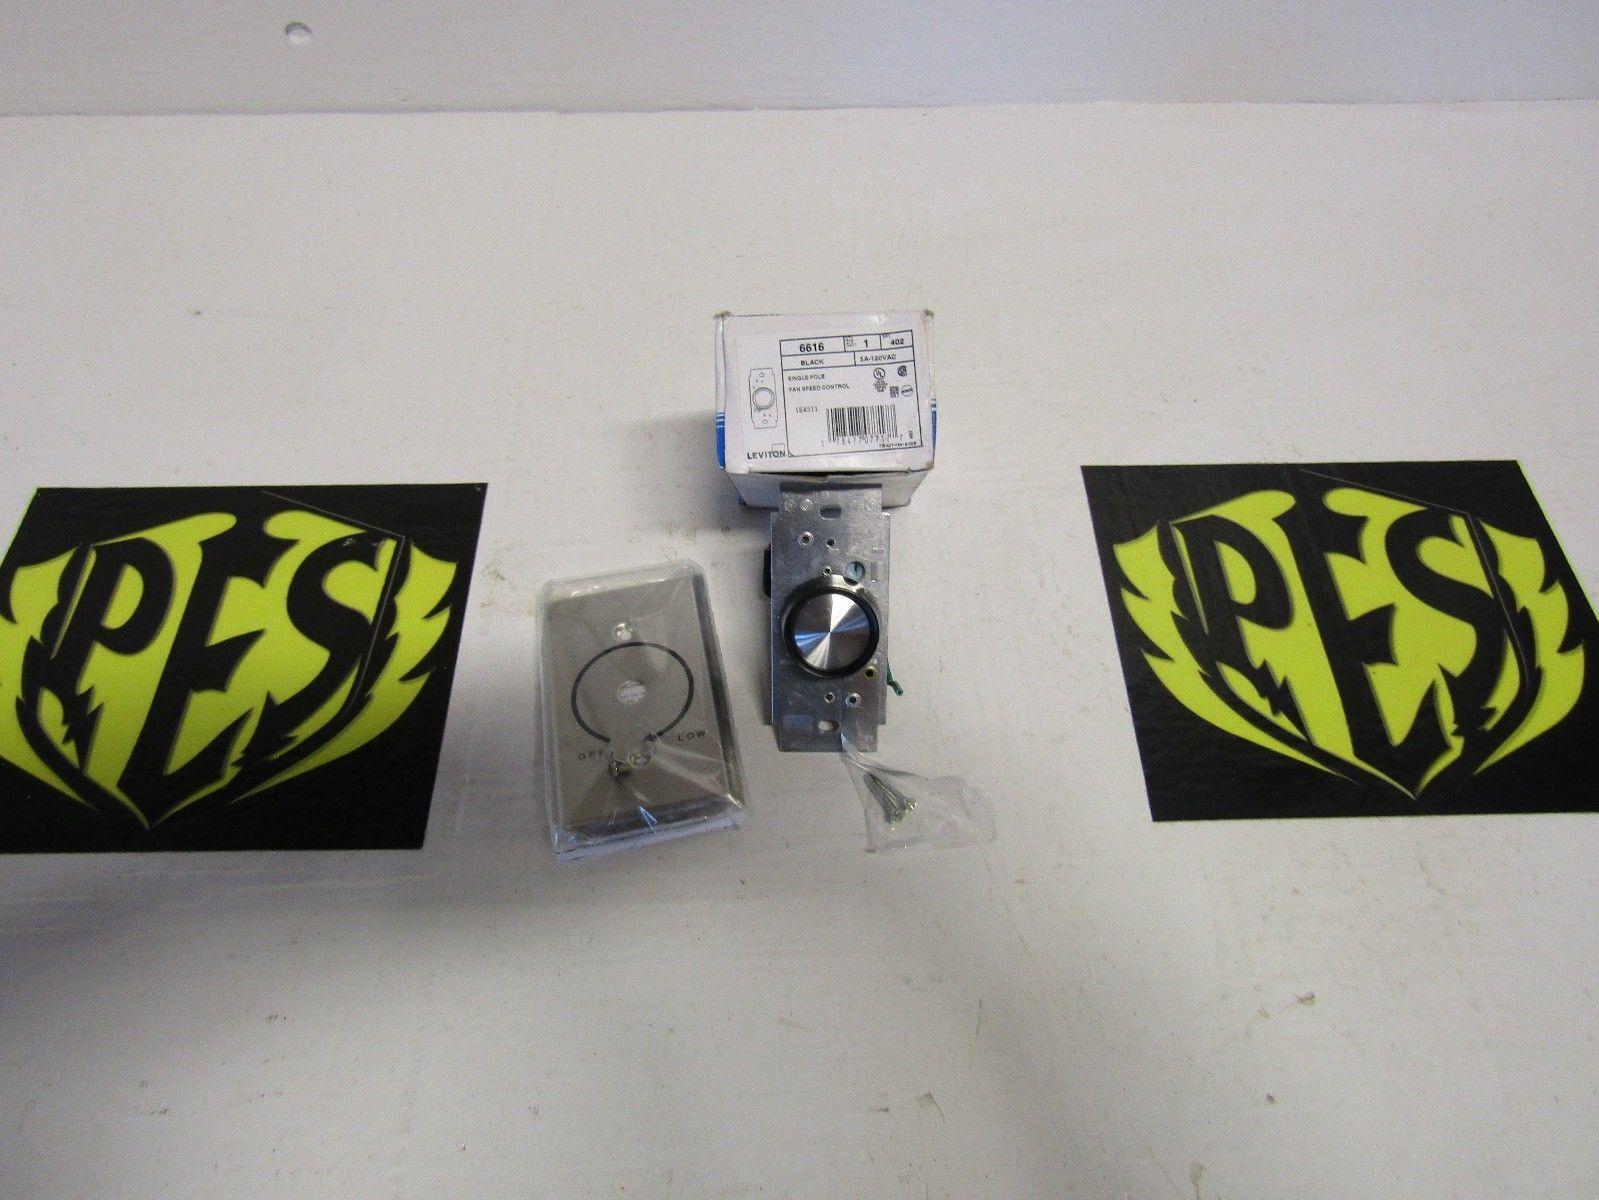 LOT OF 8 LEVITON 6616 1 POLE 5A-120VAC FAN SPEED CONTROL | Powered ...